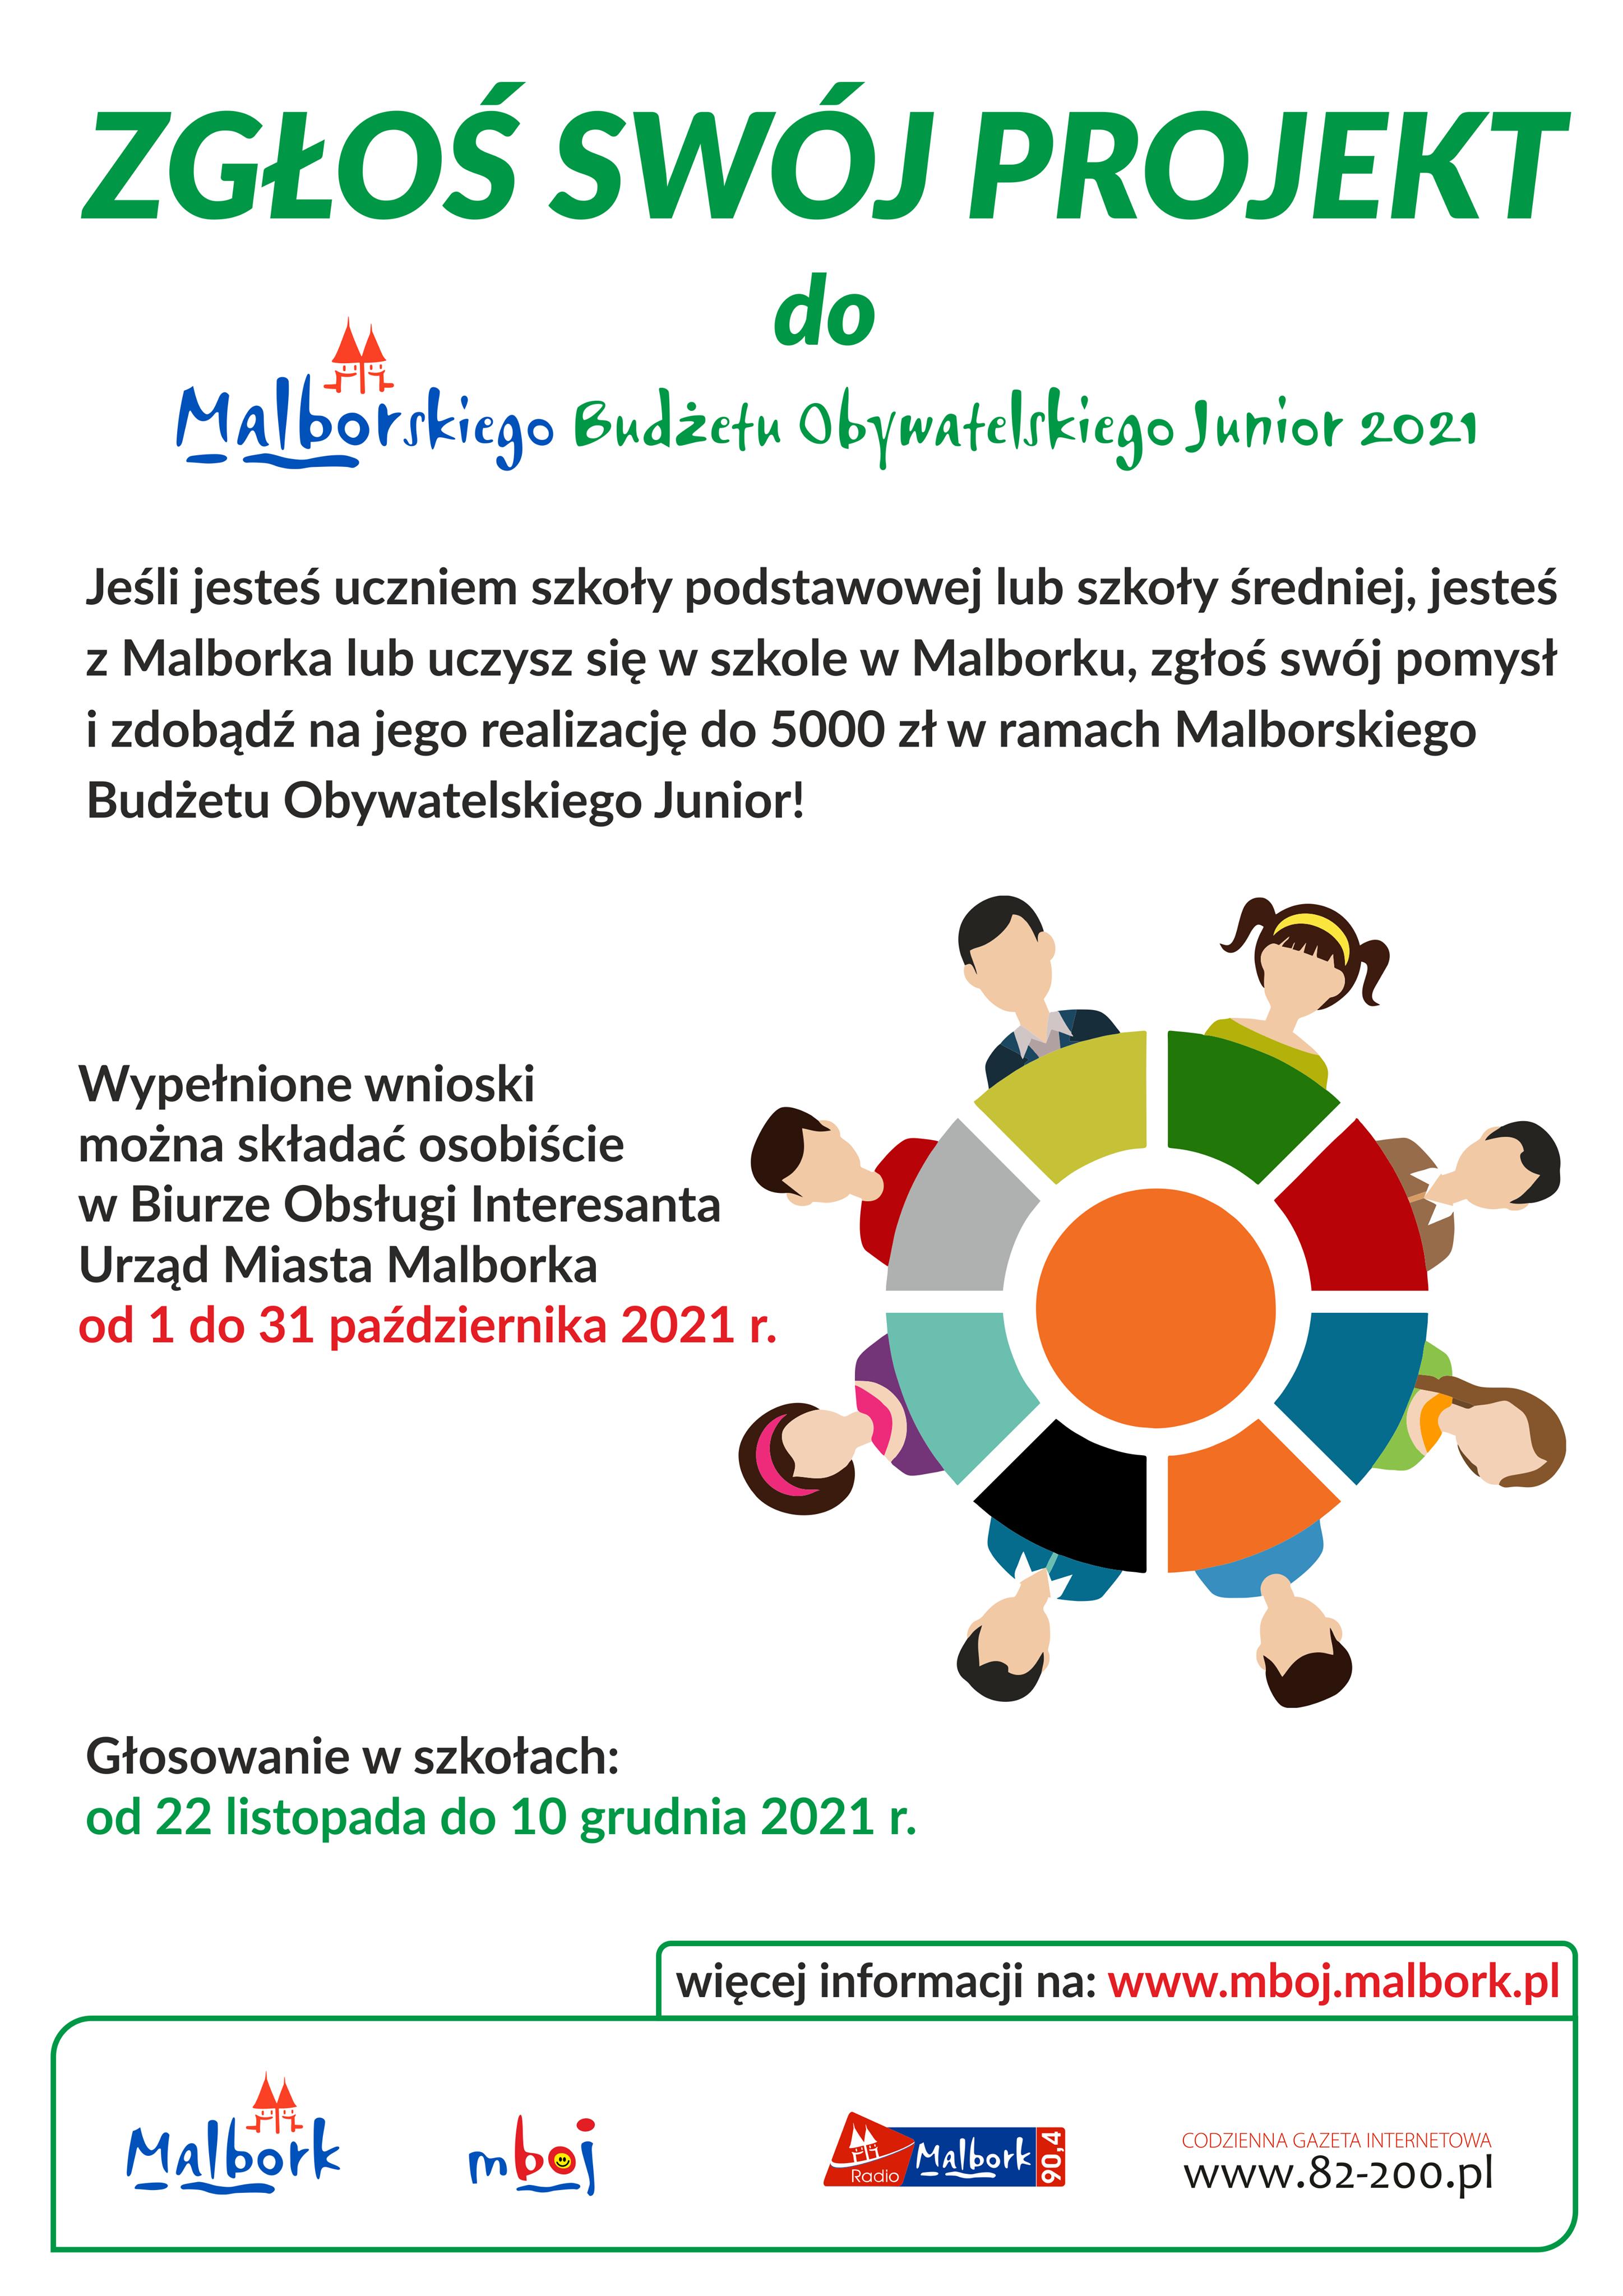 http://m.82-200.pl/2021/10/orig/mboj-lakat-2022-7533.png